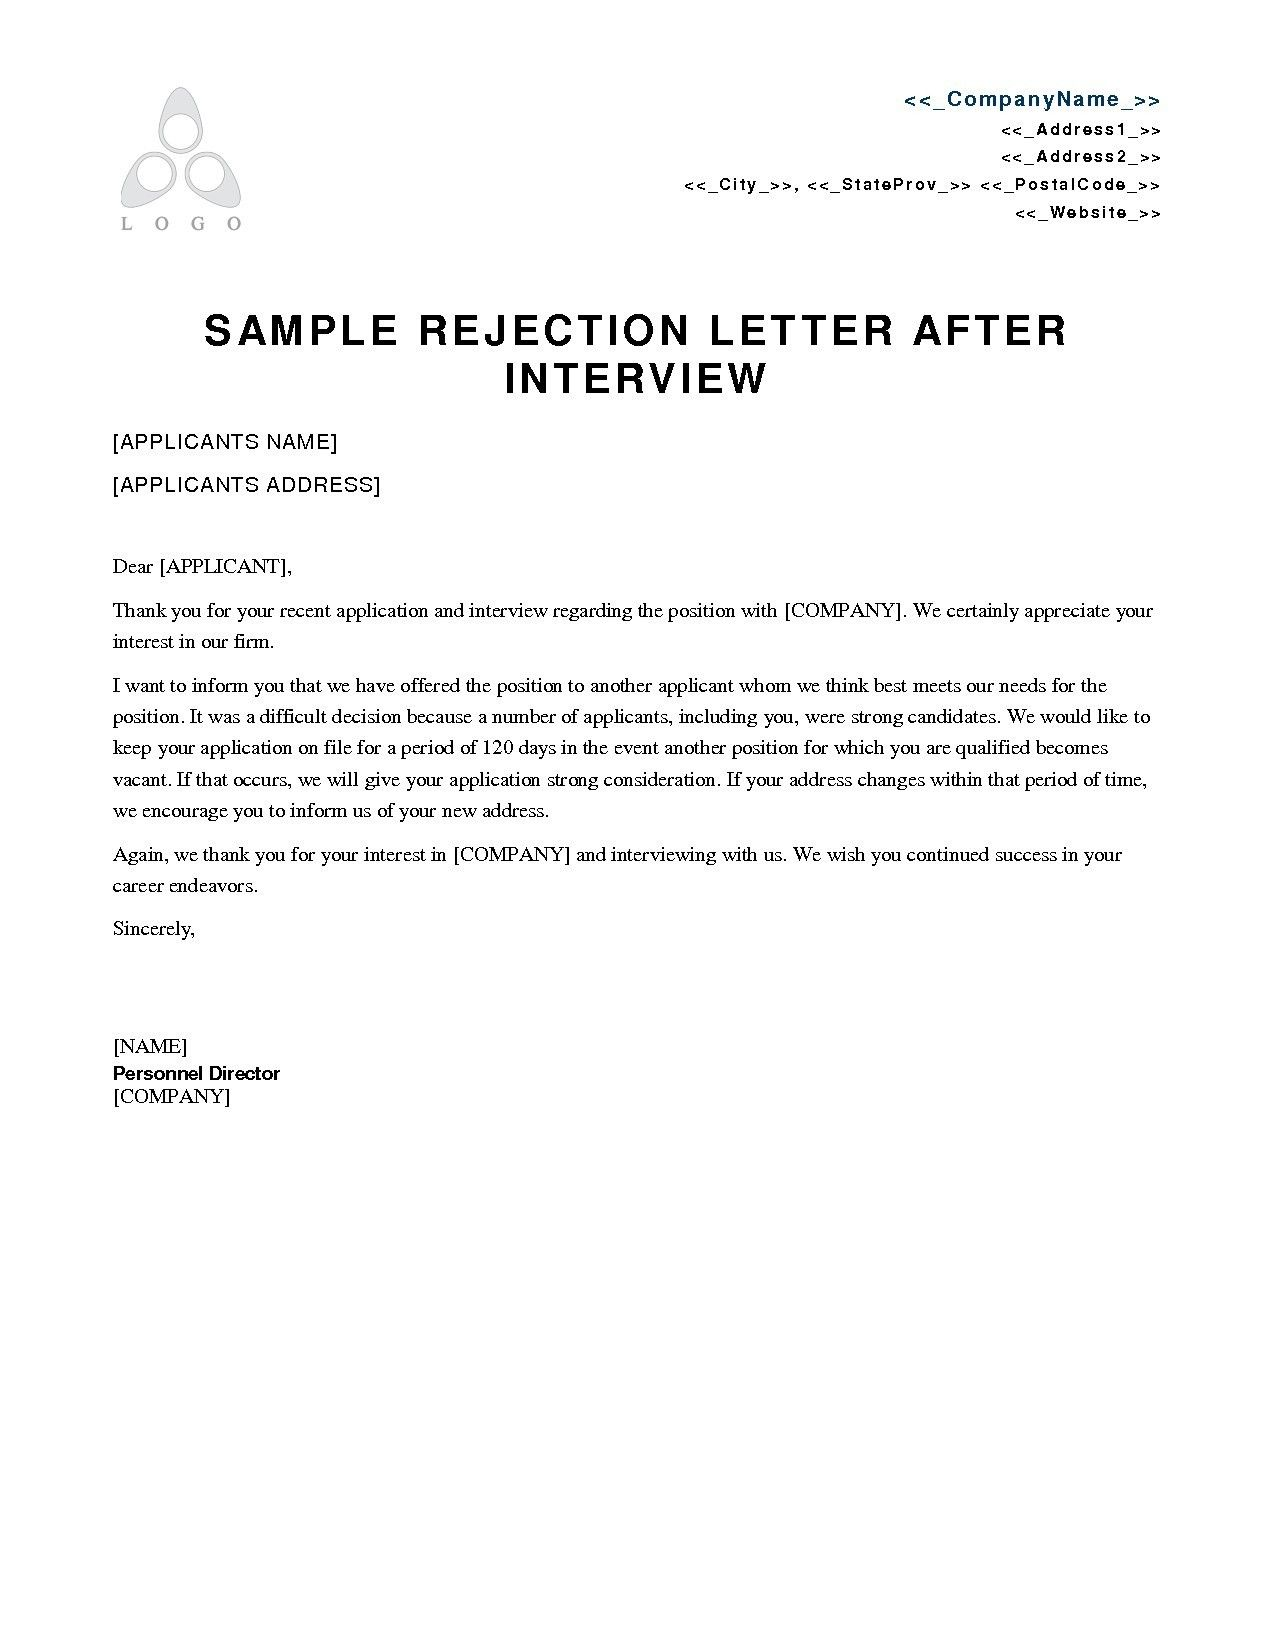 New Job Rejection Letter Template Job Rejection Letter After